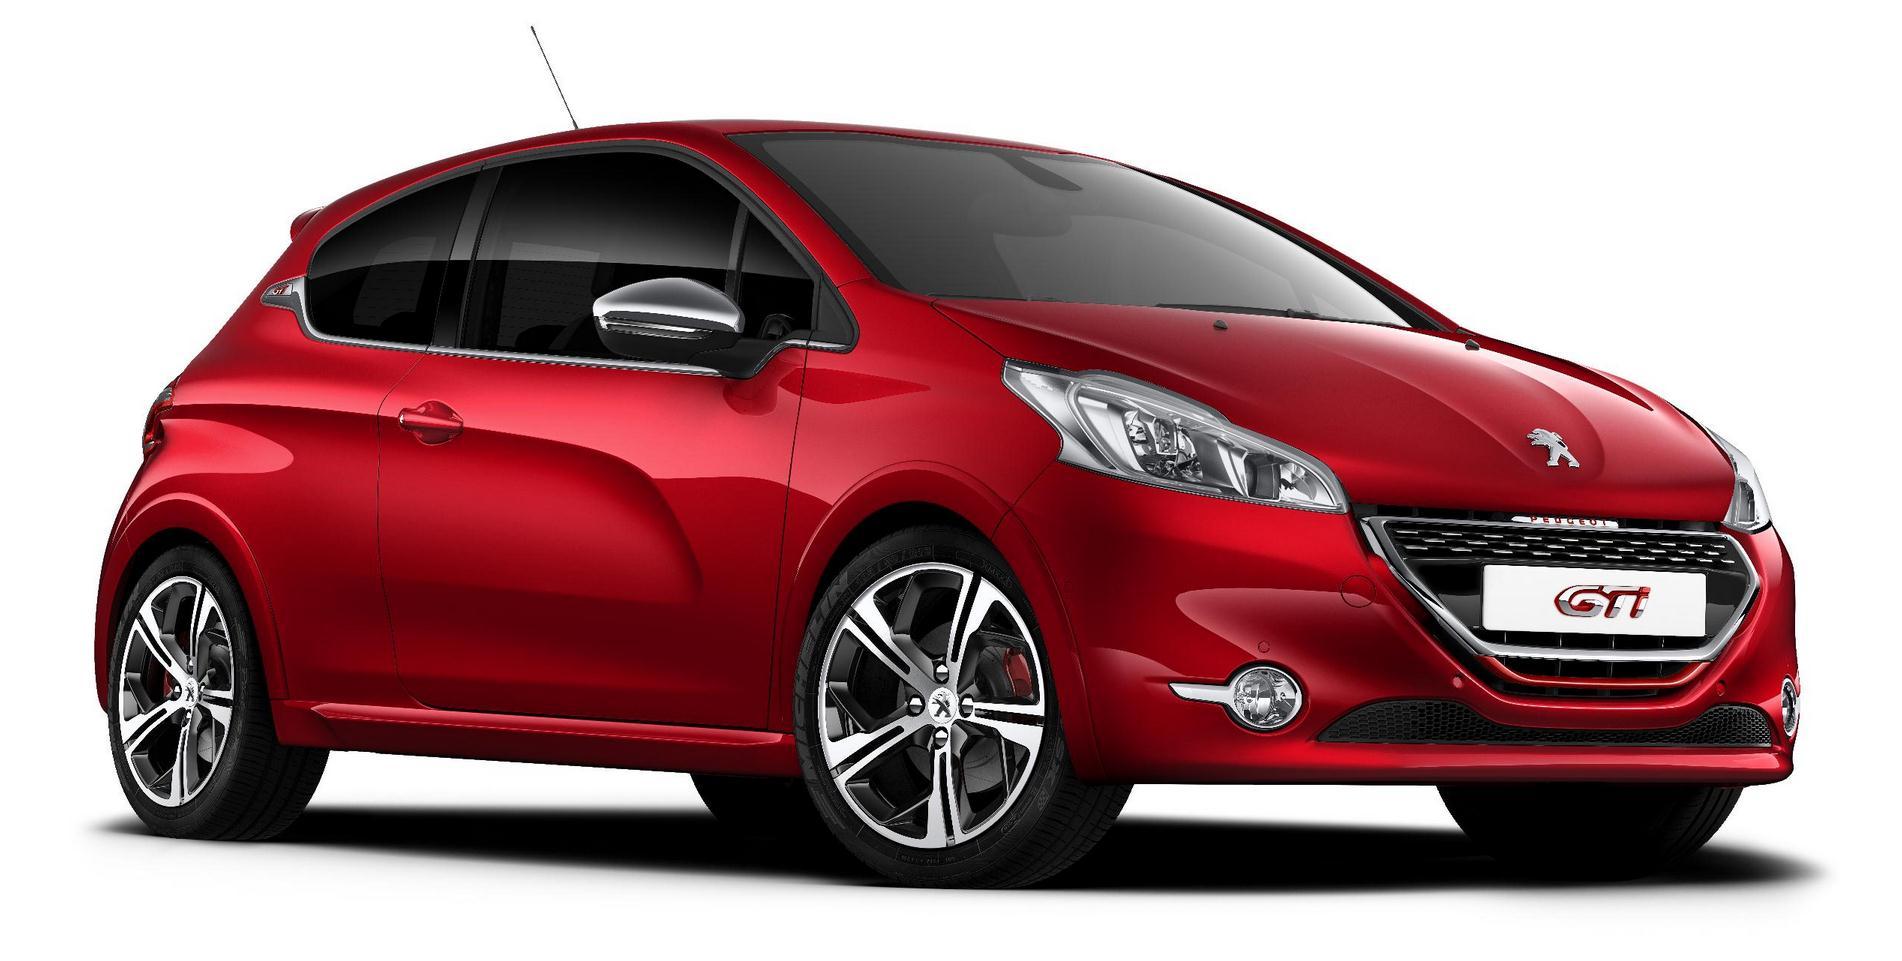 2013 Peugeot models